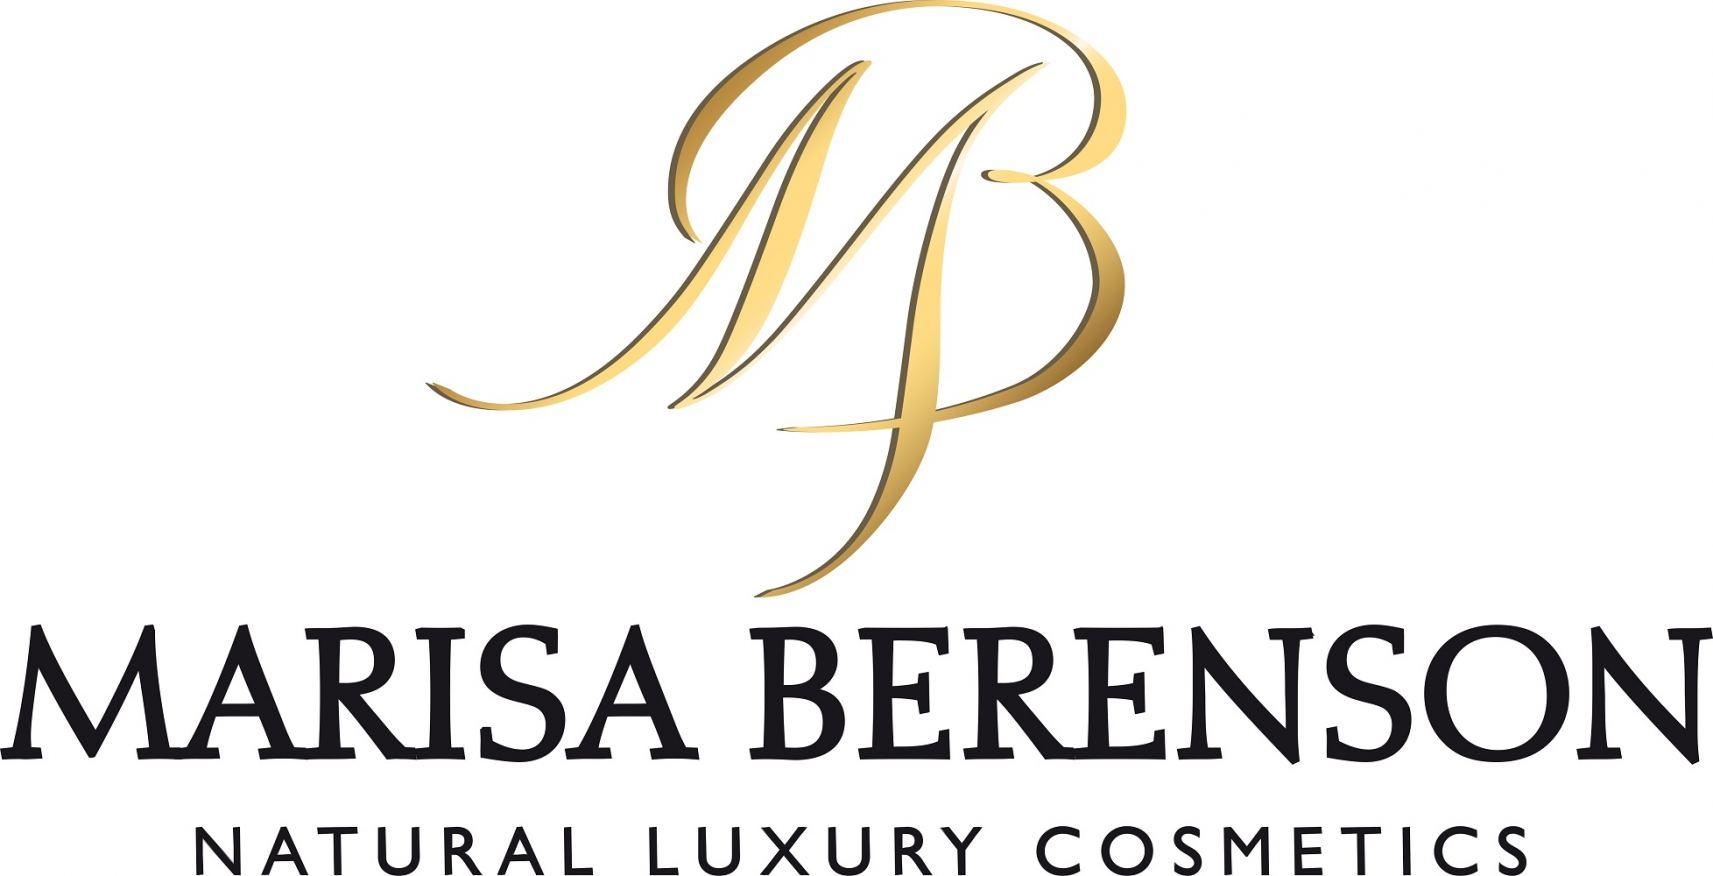 Marisa Berenson Natural Luxury Cosmetics